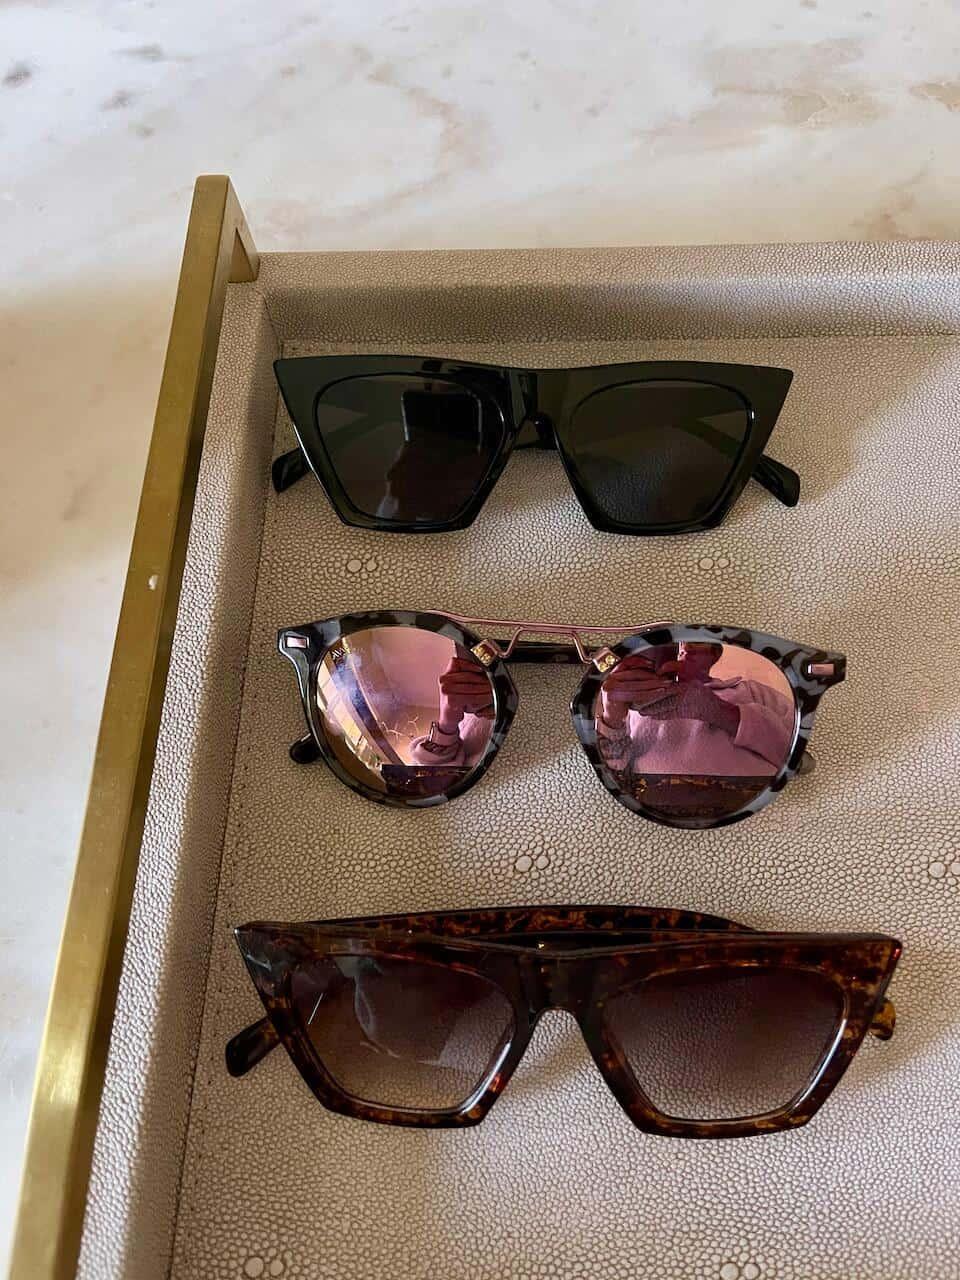 Amazon Fashion November 2020 Haul